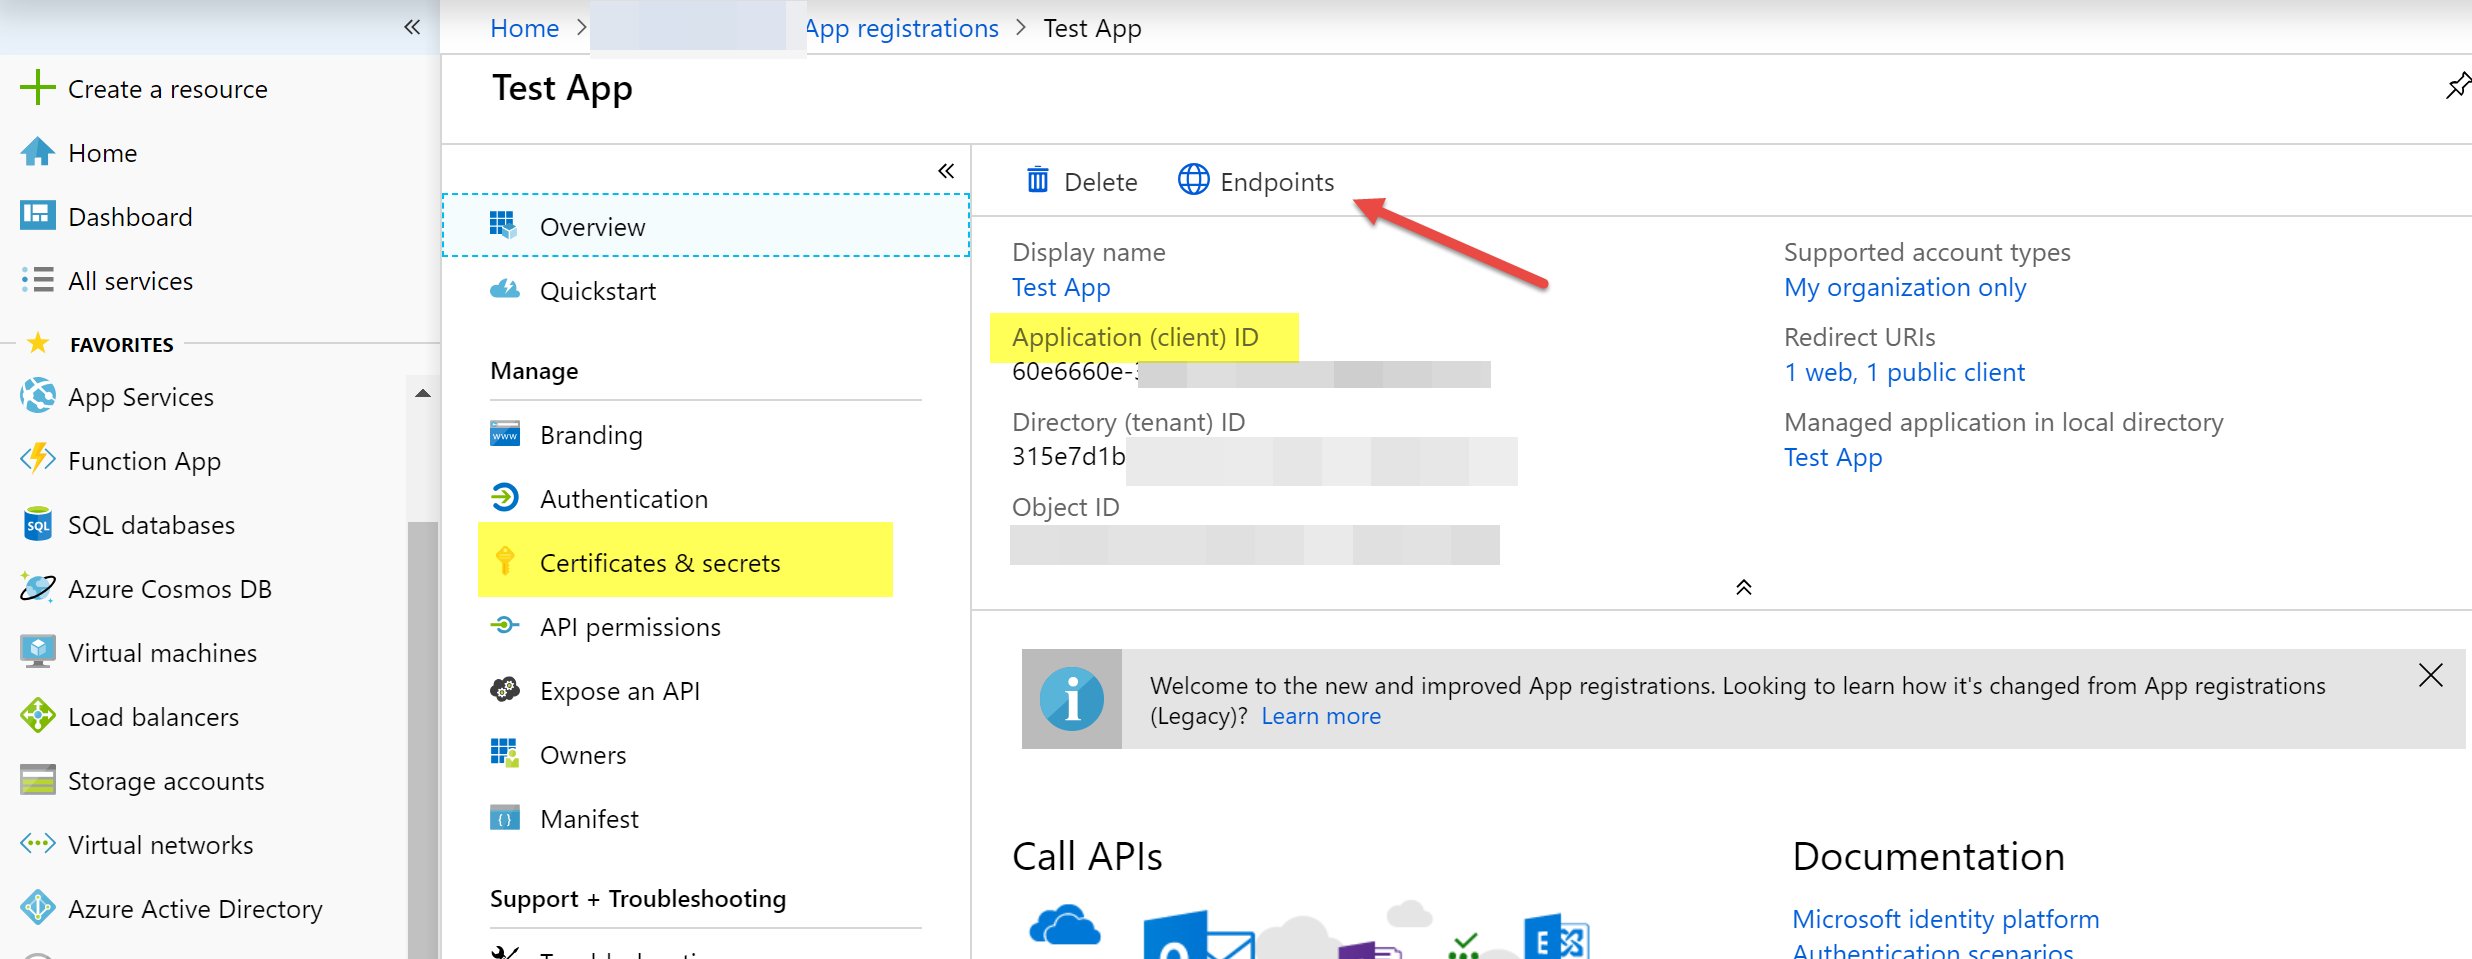 Use Postman for Dynamics 365 with Web API